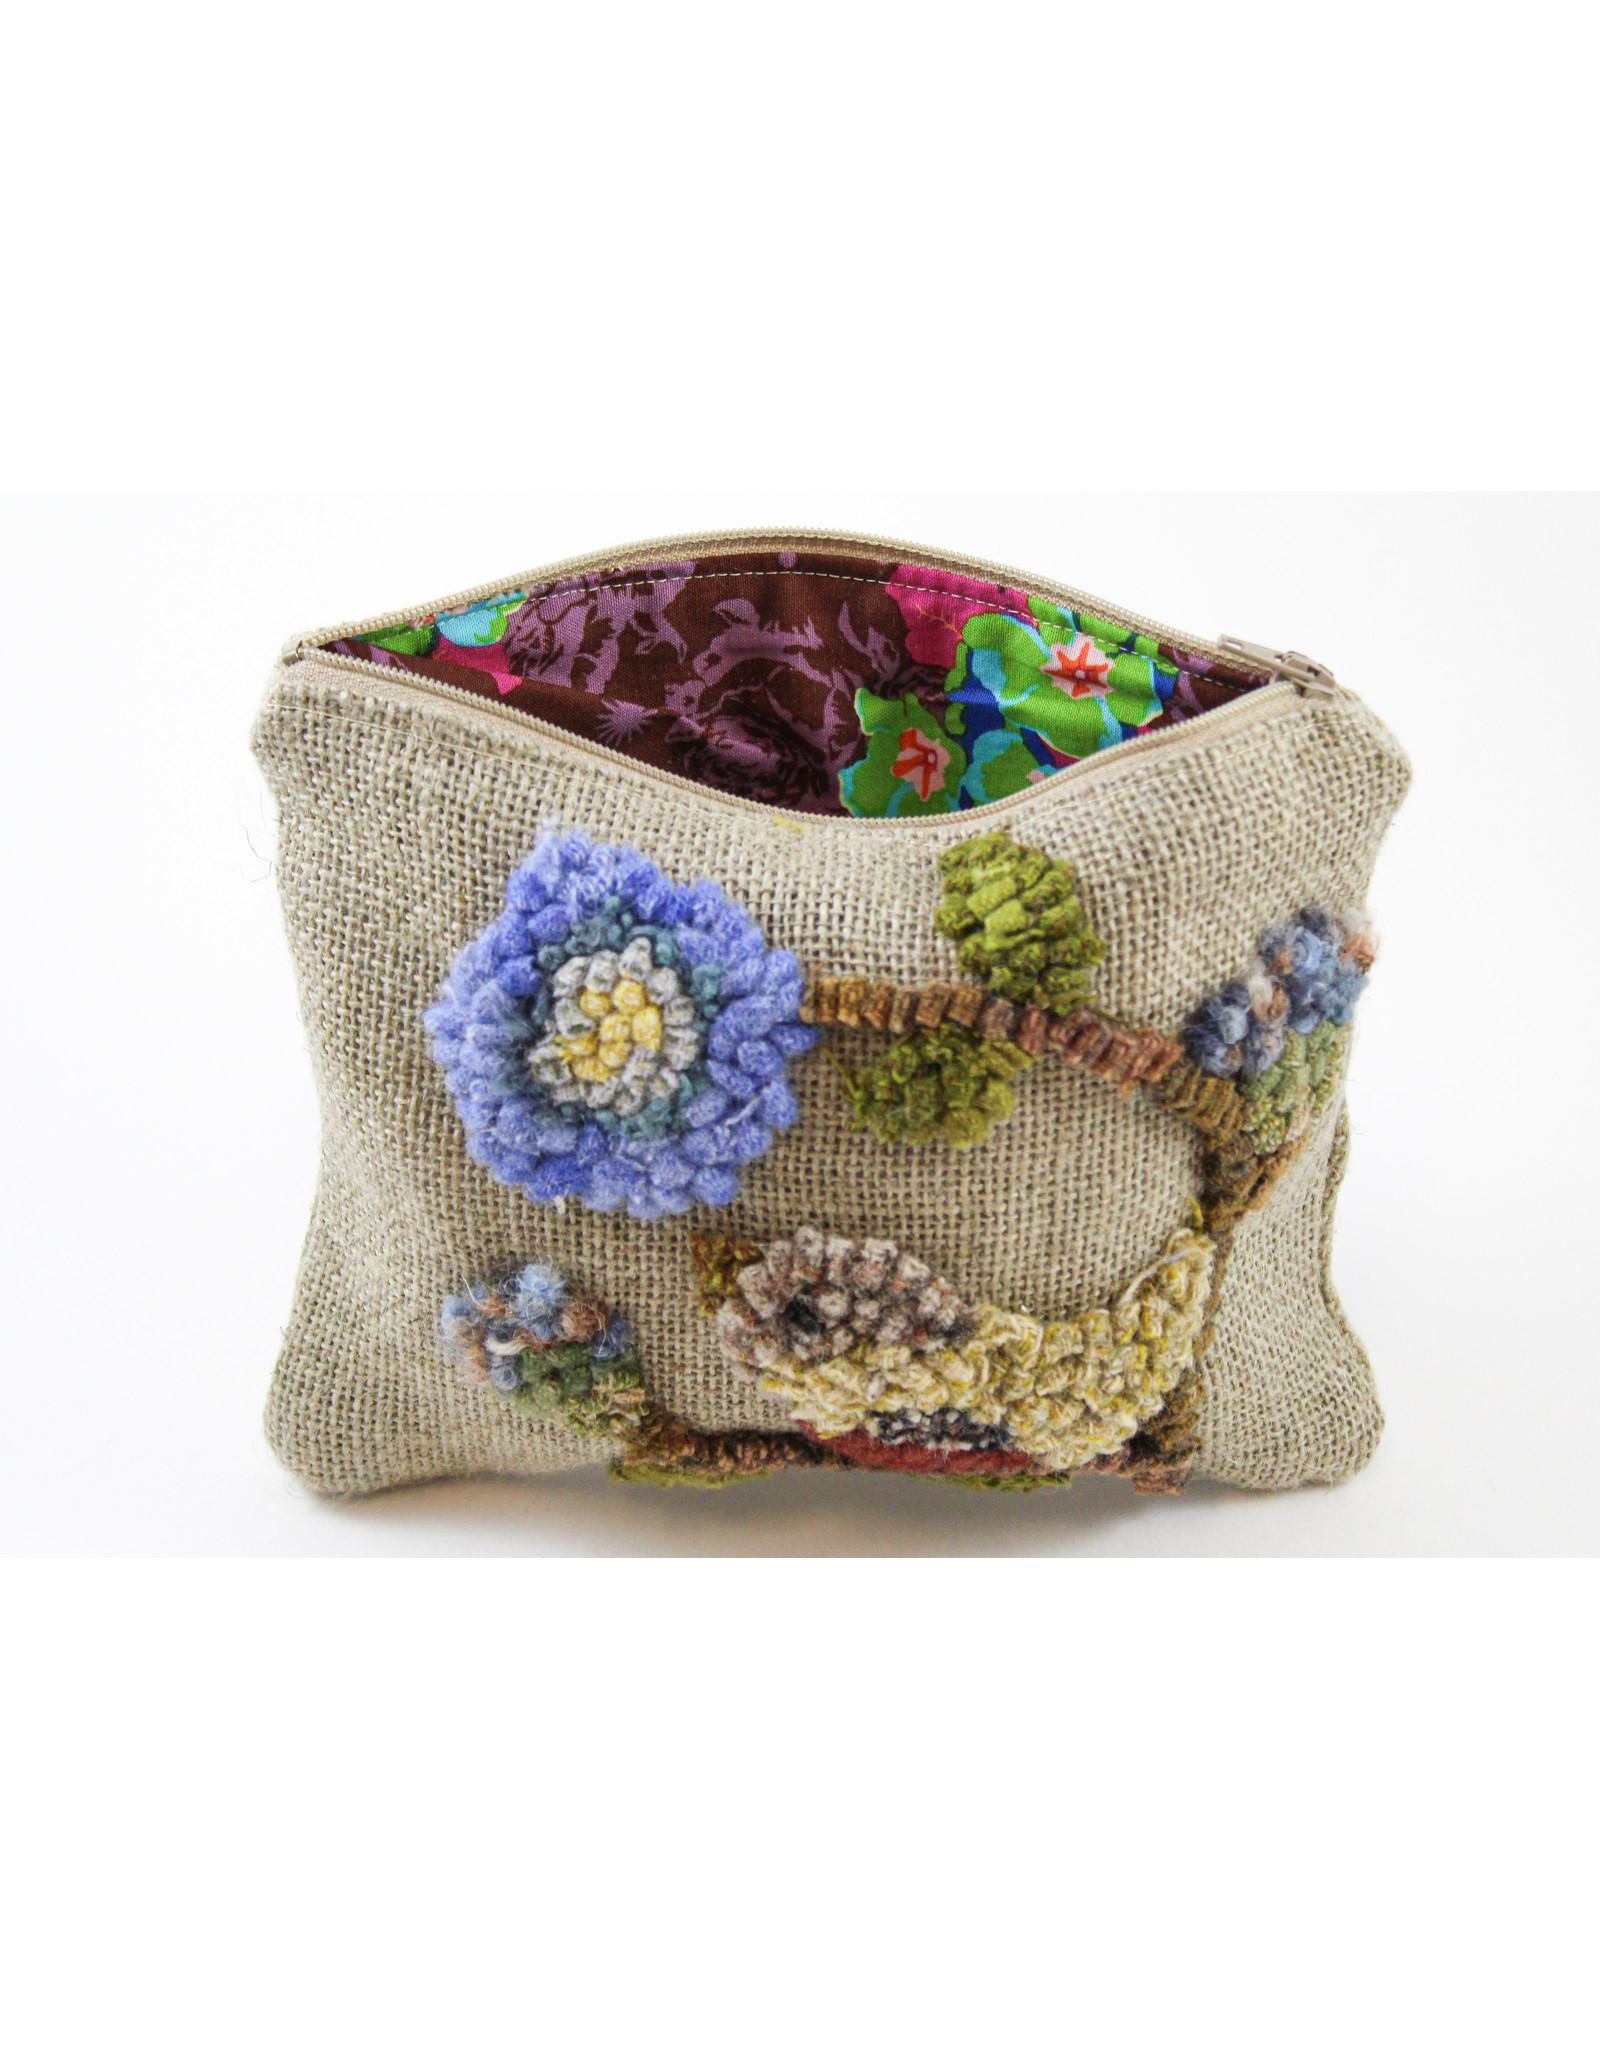 Paula Davis Cosmetic/Utility Bag by Loop Maker